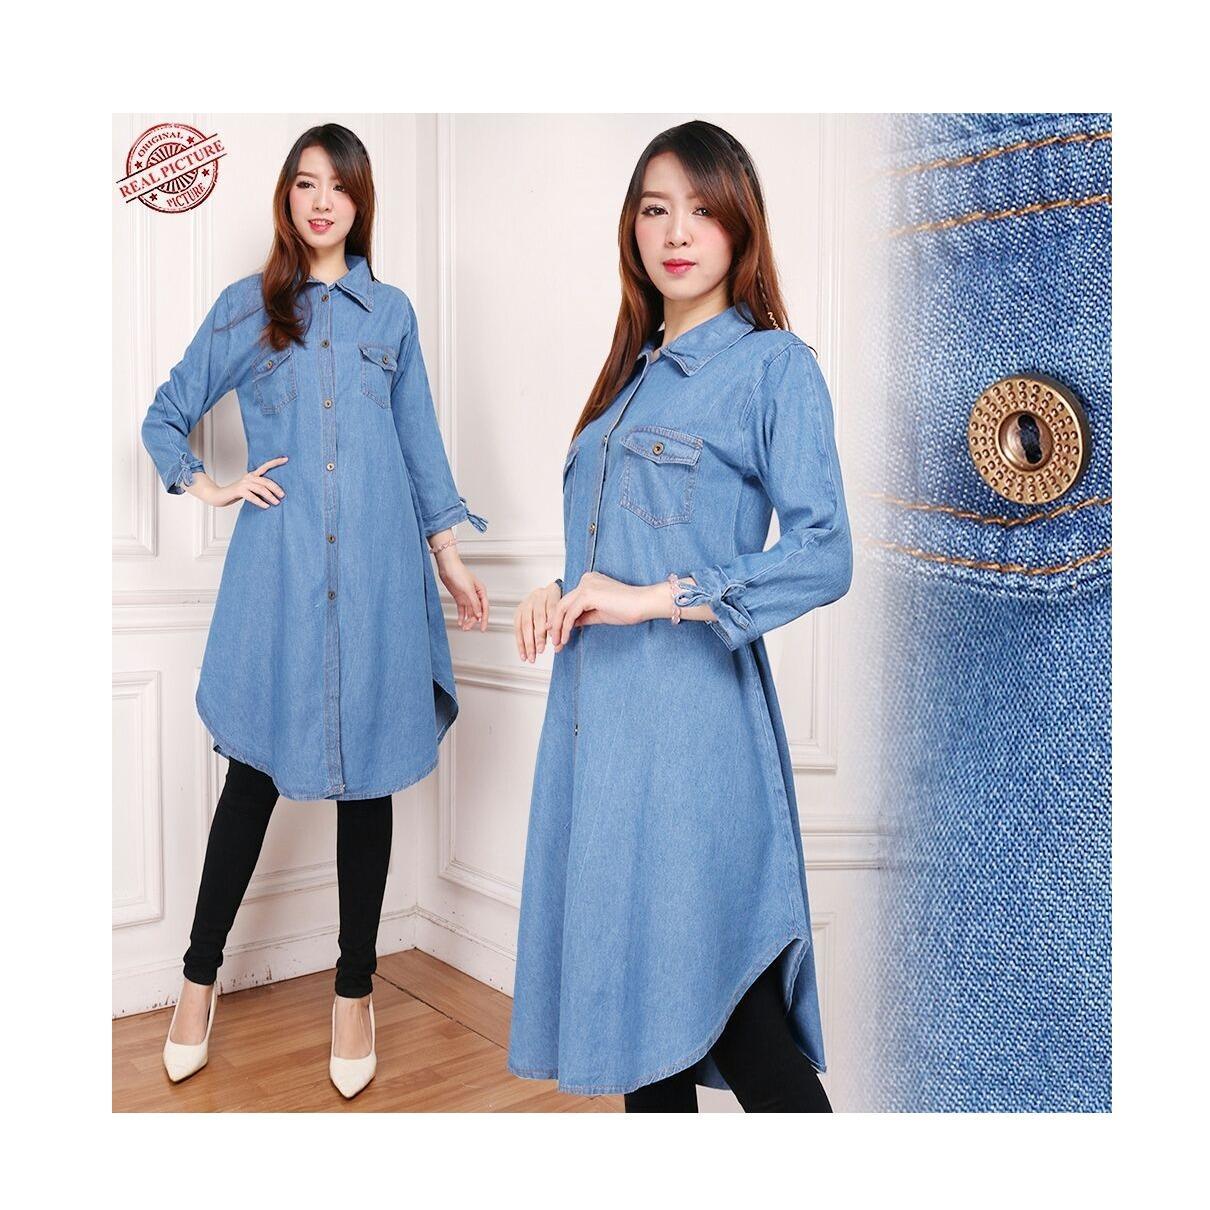 Cj collection Atasan blouse kemeja tunik jeans wanita jumbo long tunik shirt Rani